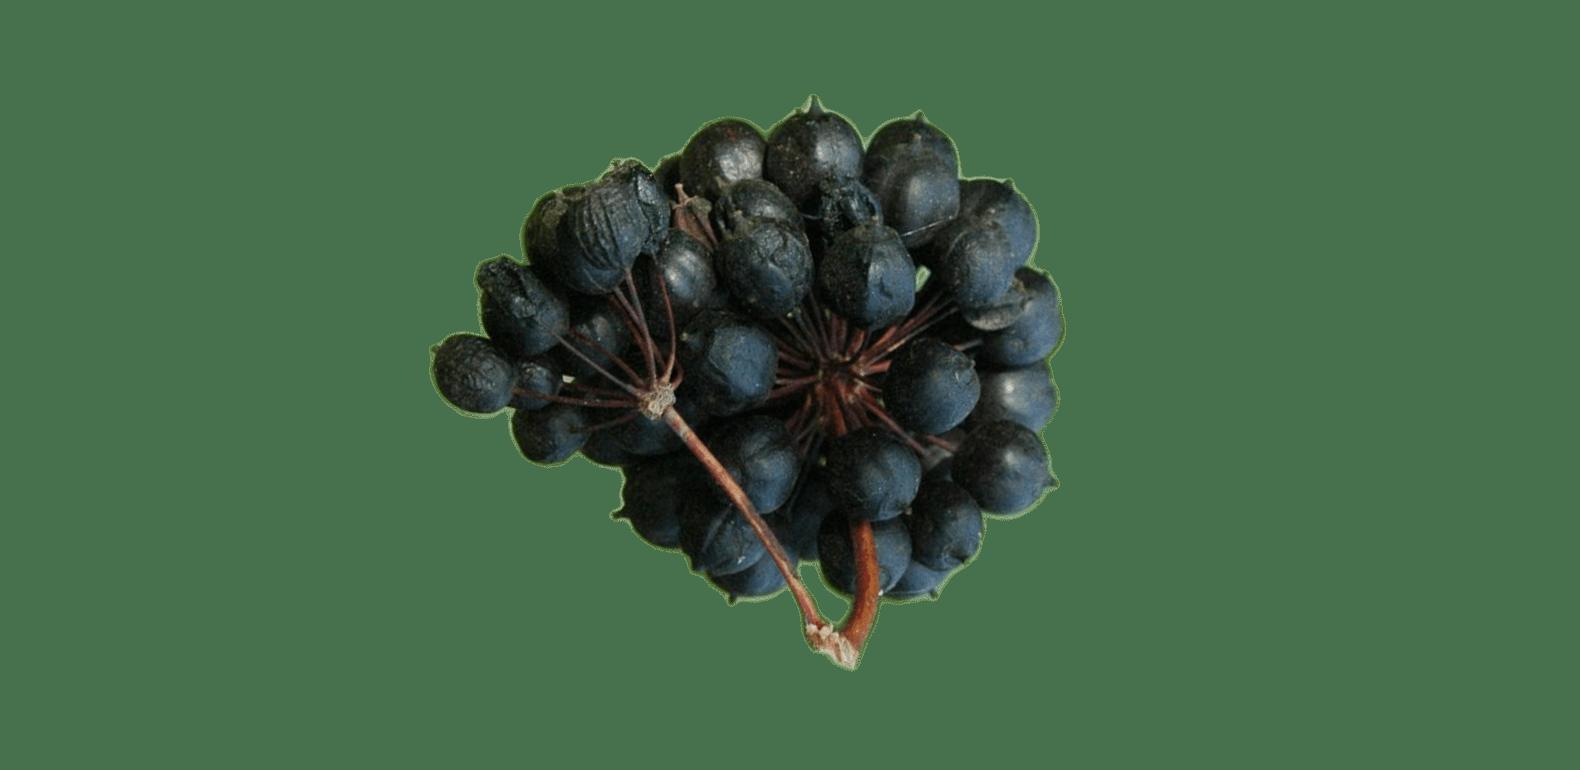 Éleuthérocoque – Eleutherococcus senticosus – Ginseng de Sibérie